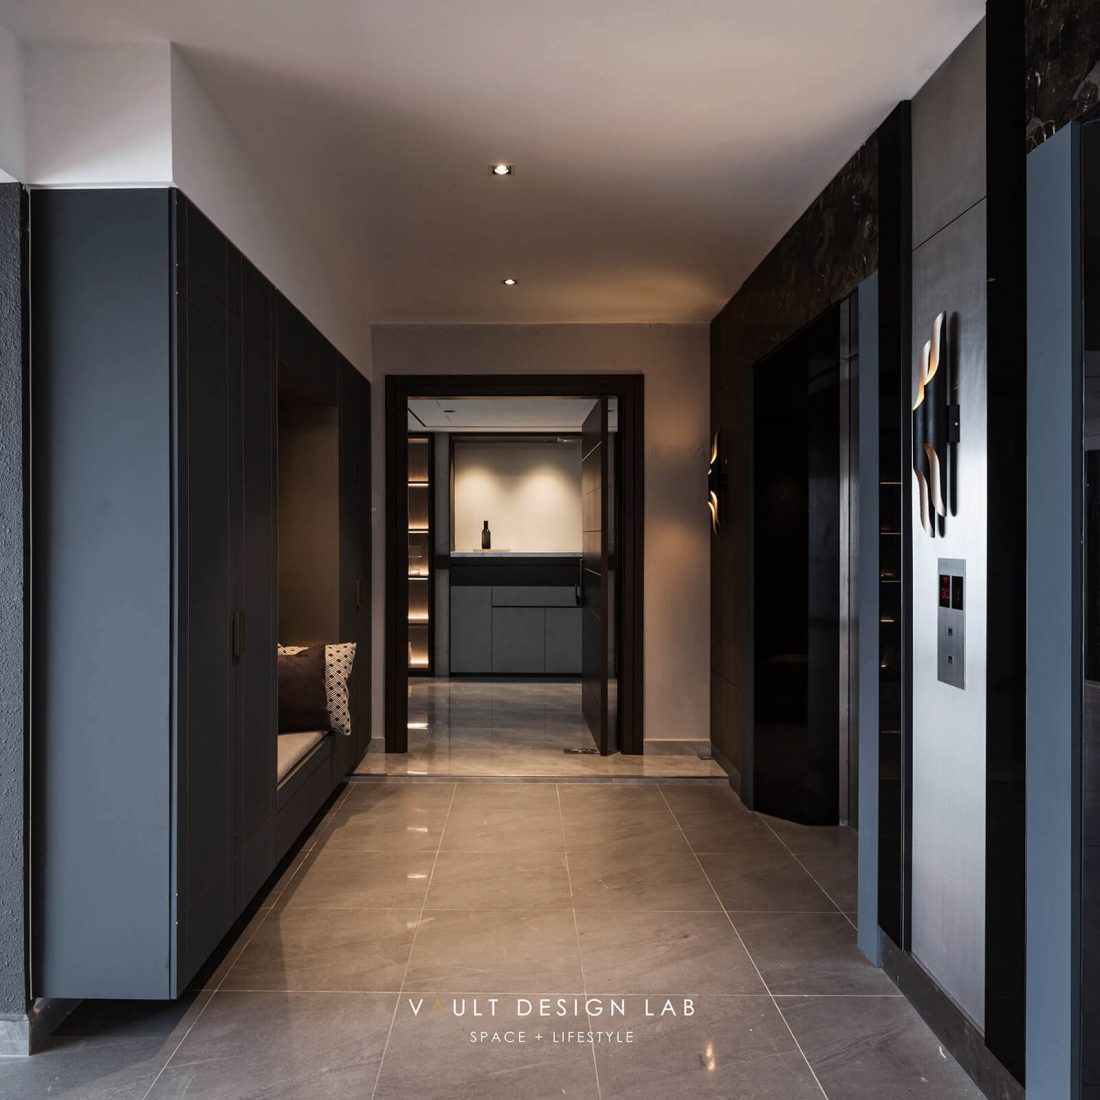 Interior-Design-One-Tanjong-Tanjung-Bungah-Penang-Malaysia-Private-Lift-Lobby-Design-v3